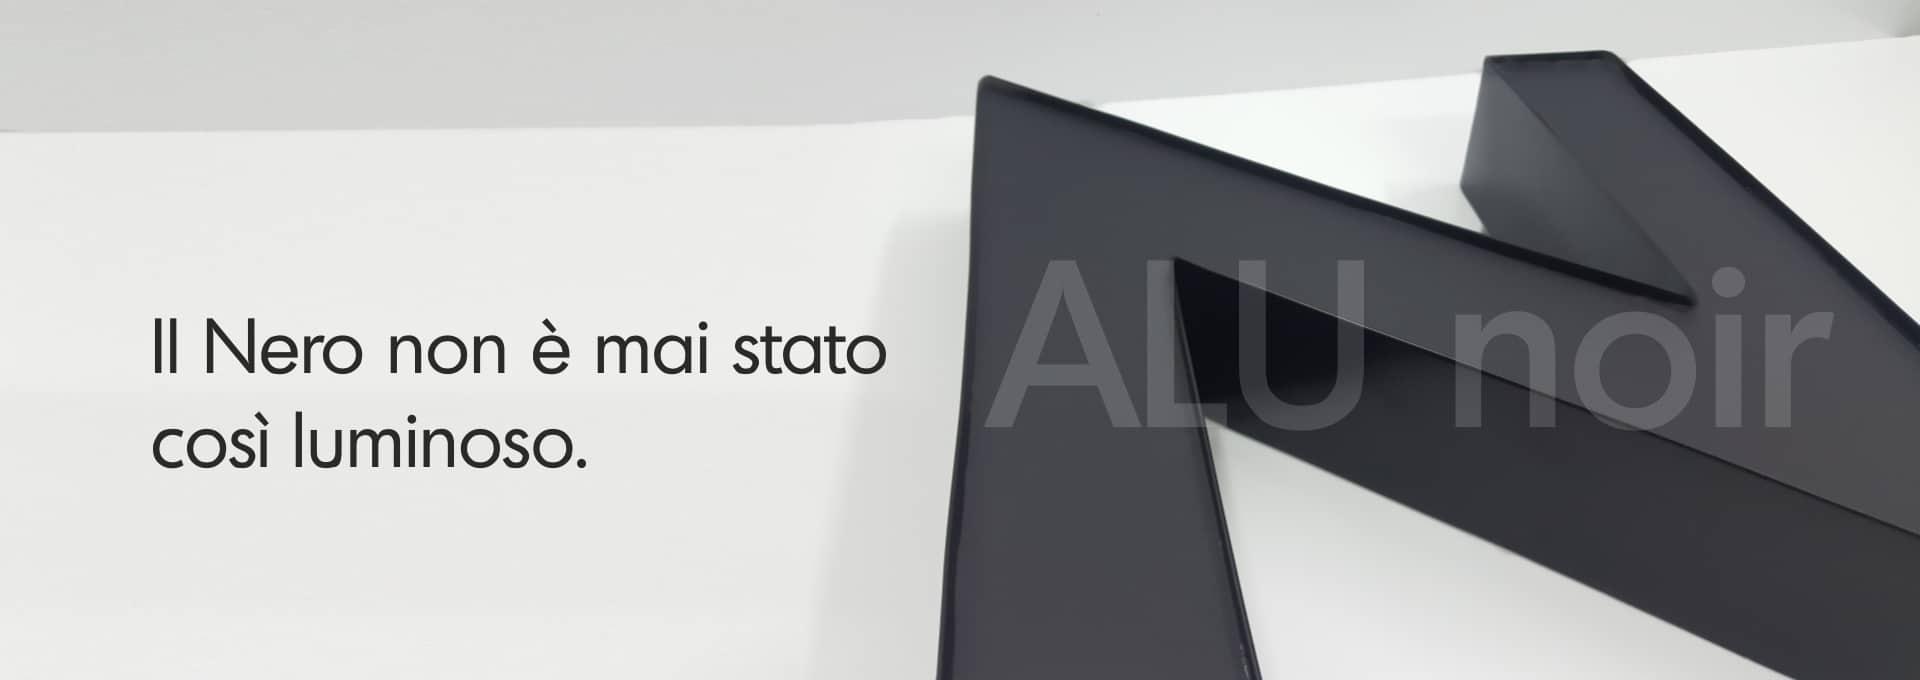 lettere scatolate nere